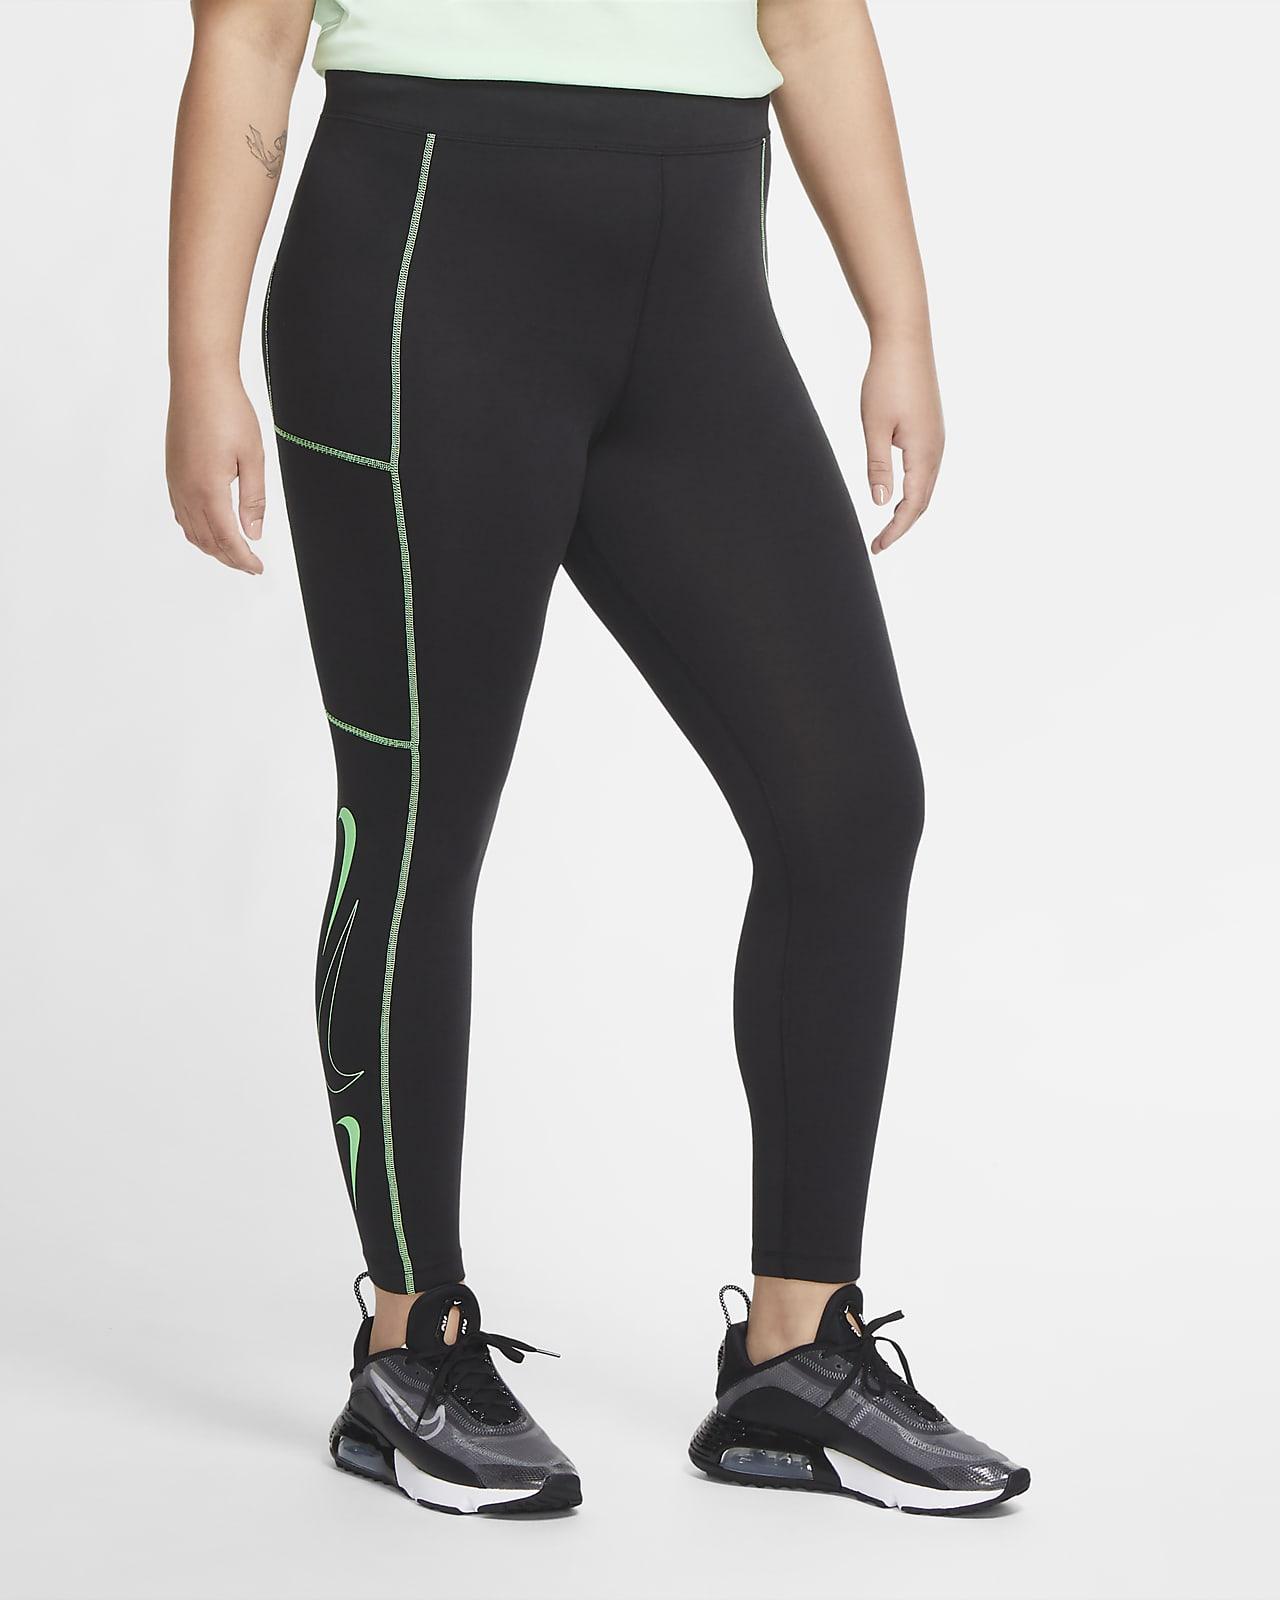 Leggings de cintura alta para mujer Nike Sportswear Swoosh (talla grande)